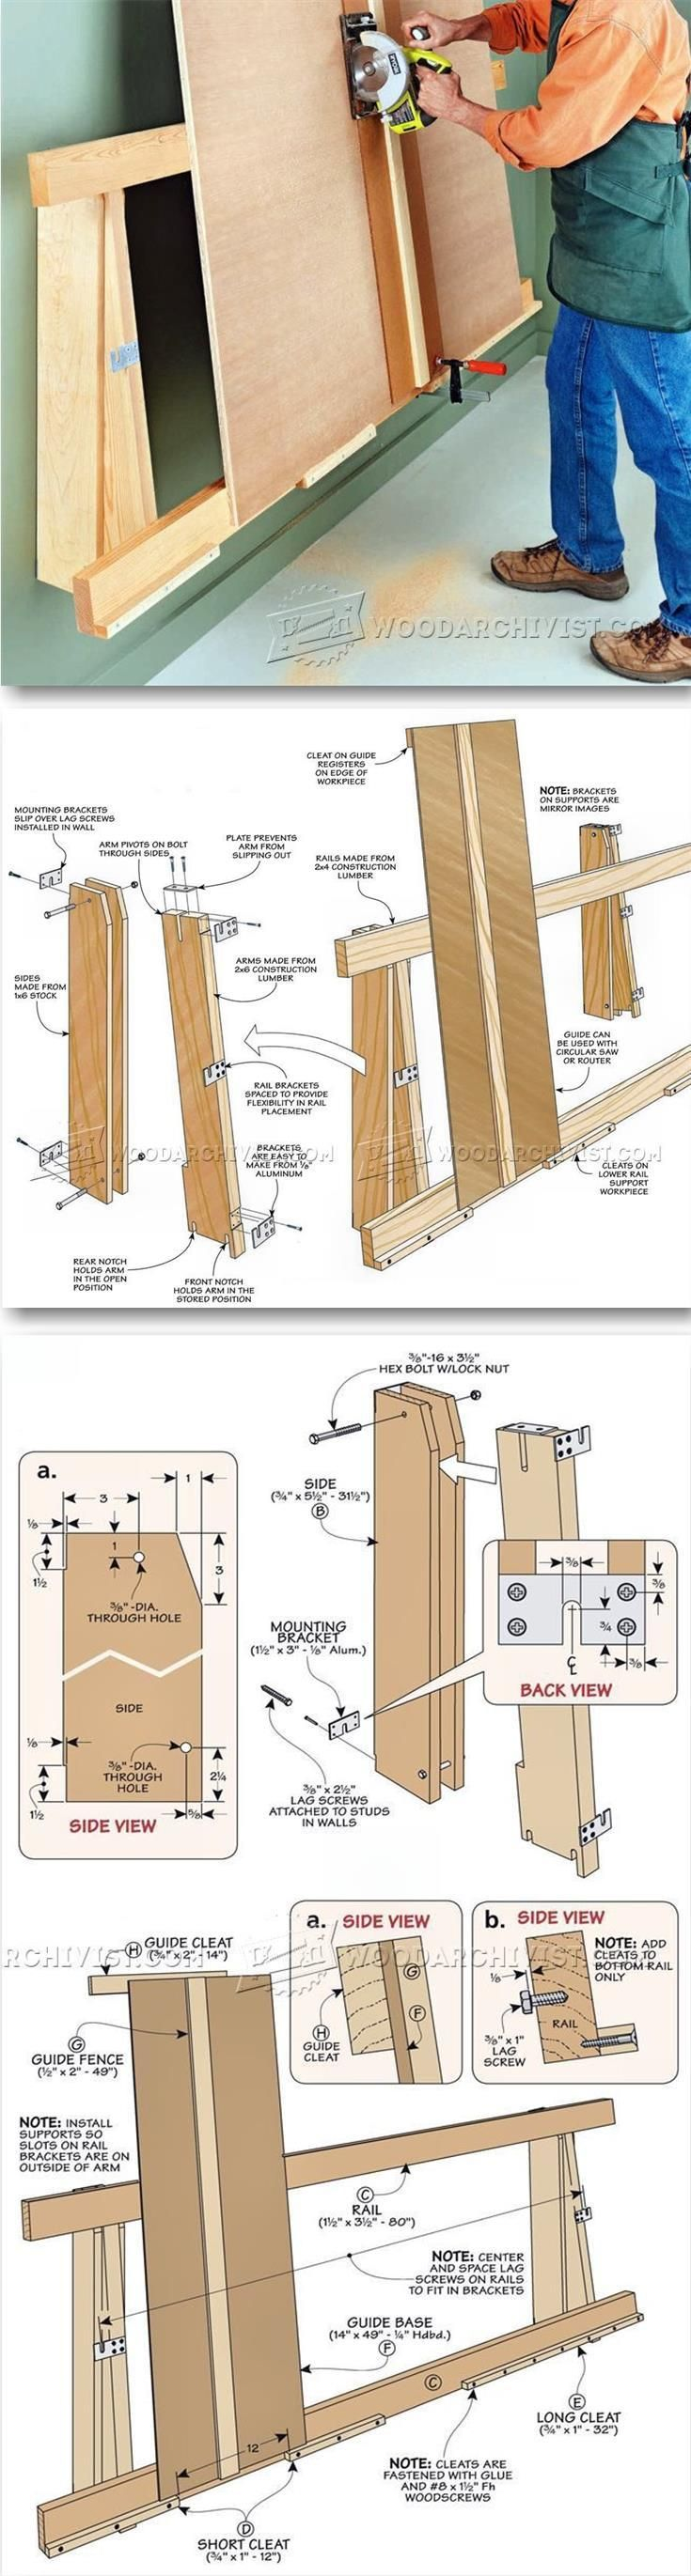 Plywood Cutting Rack - Circular Saw Tips, Jigs and Fixtures | WoodArchivist.com